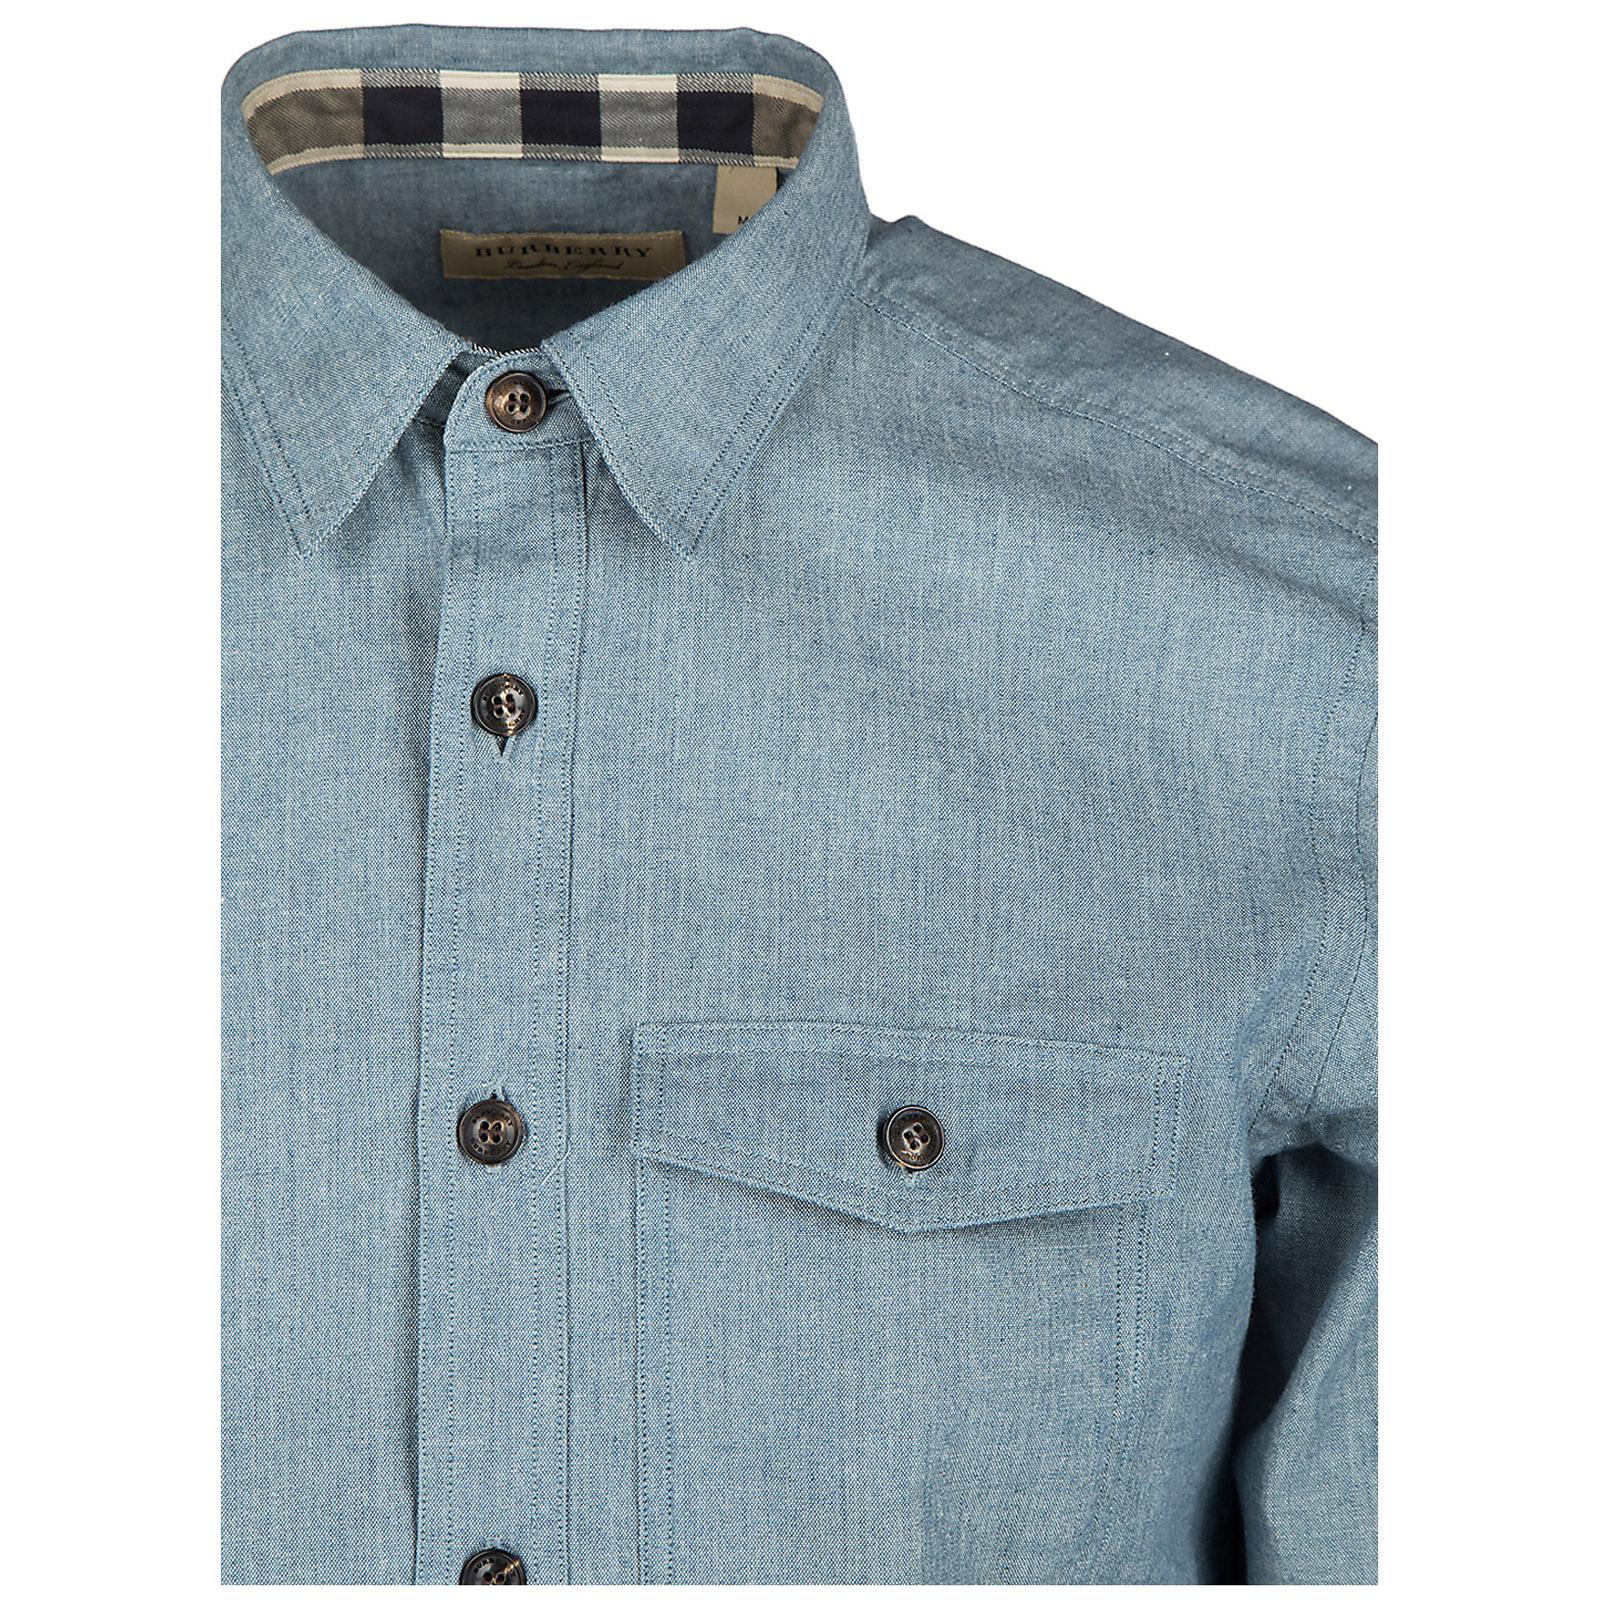 Men's long sleeve shirt dress shirt friston